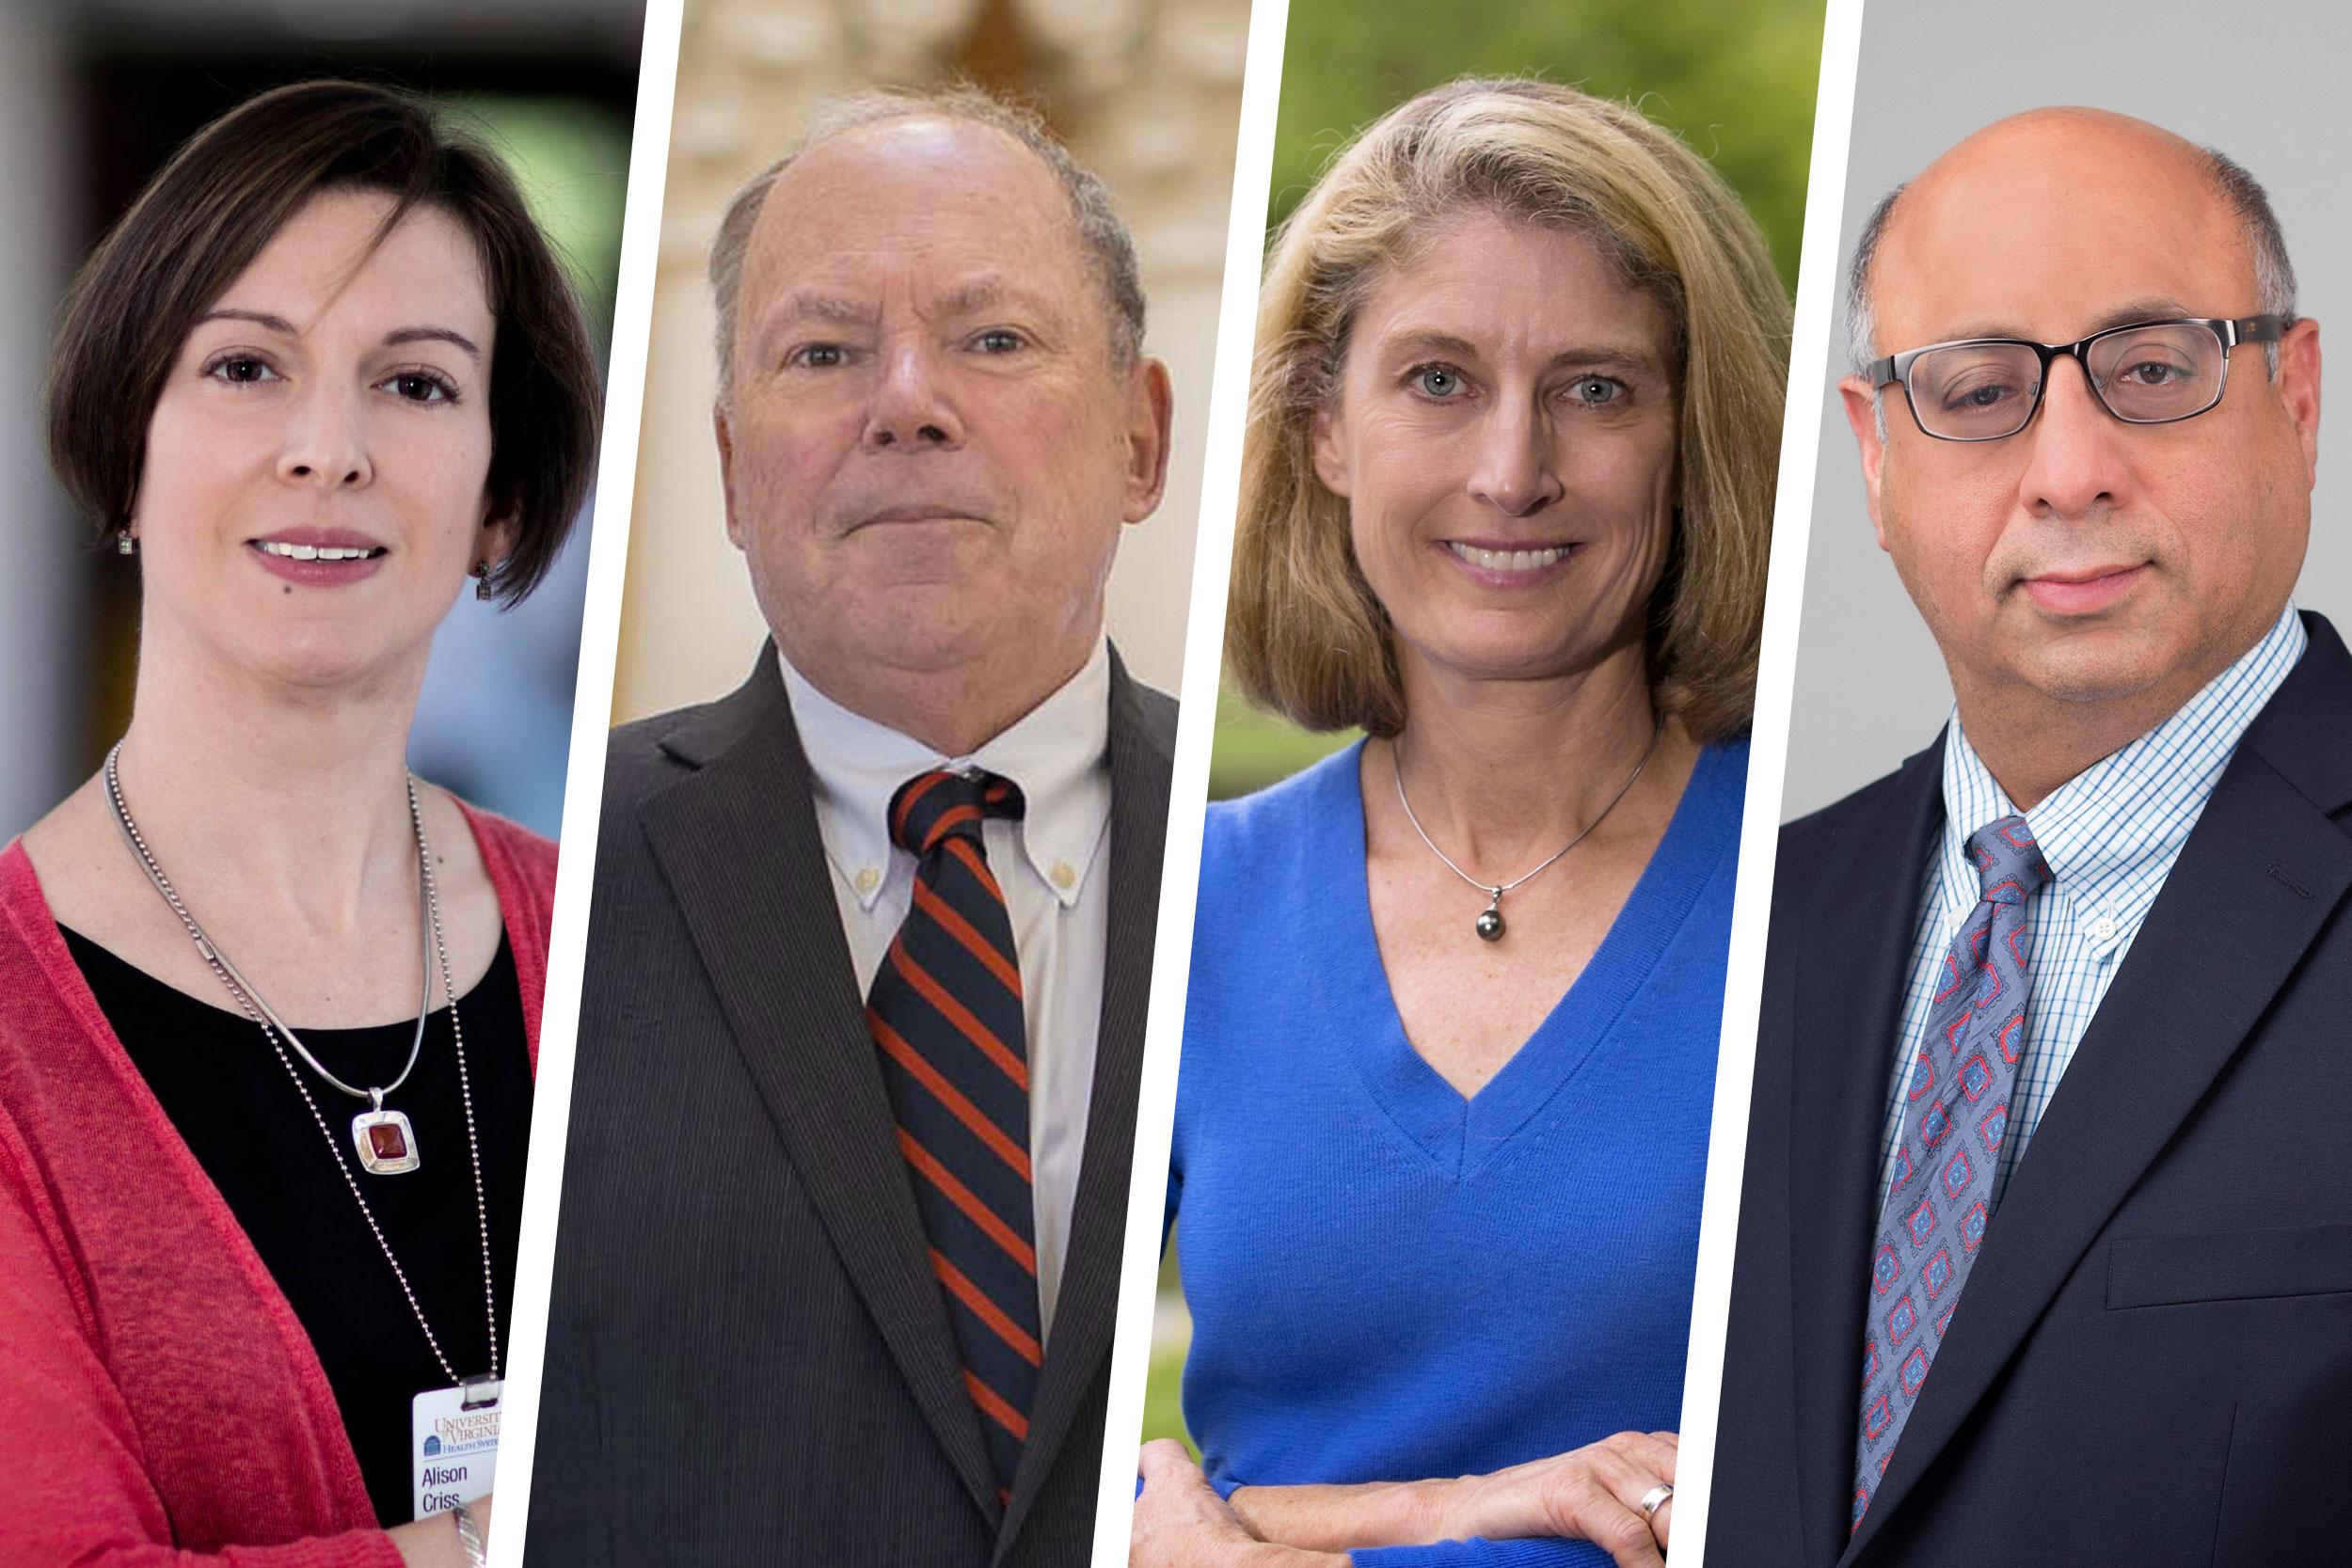 Alison Criss, Phillip Bourne, Karen McGlathery and Dr. Jaideep Kapur, they head four of UVA's pan-University institutes.